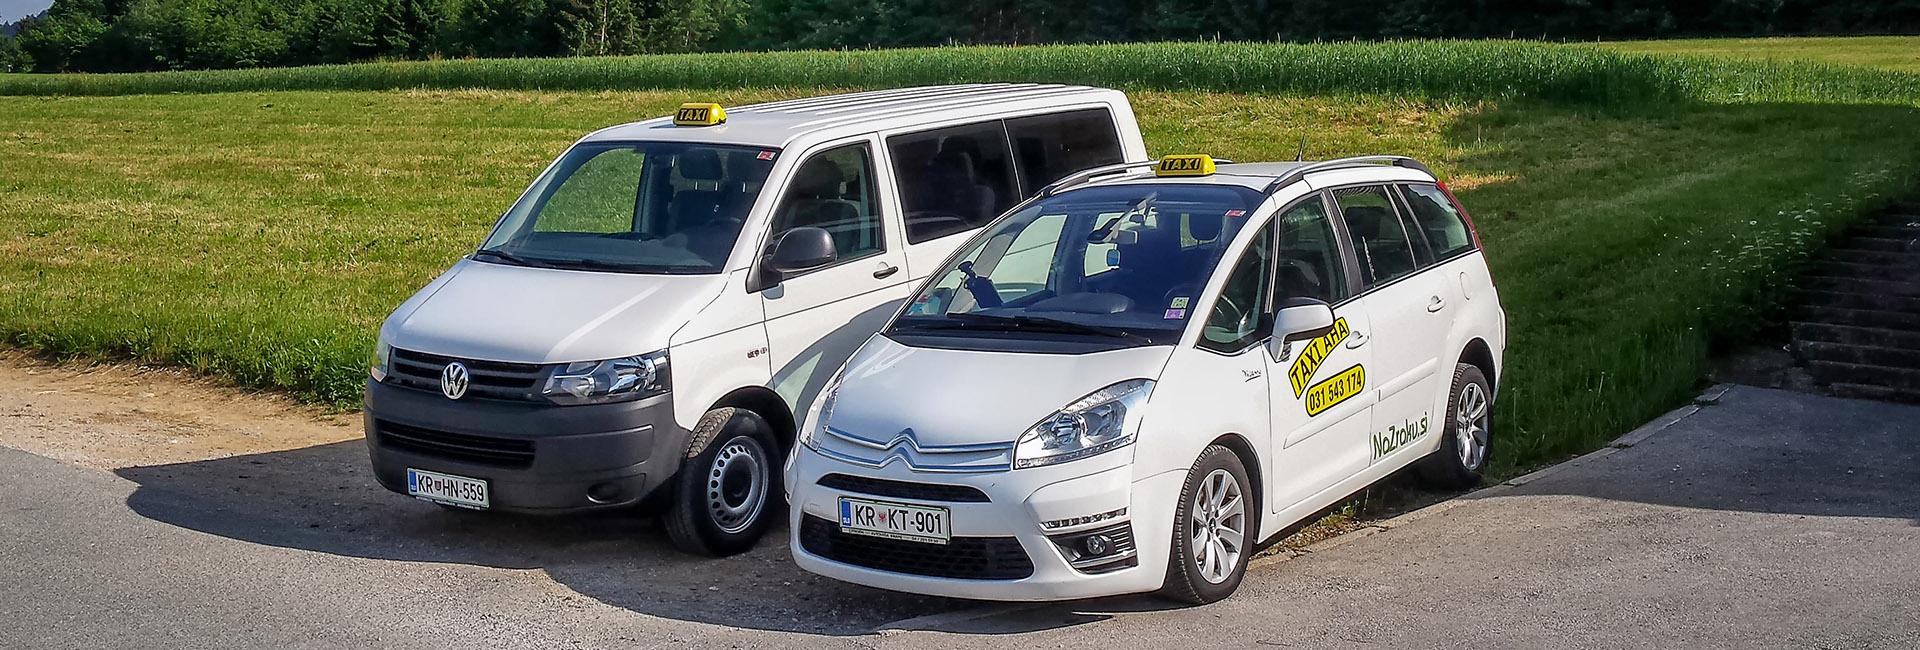 Taxi-AHA-vozni-park_1